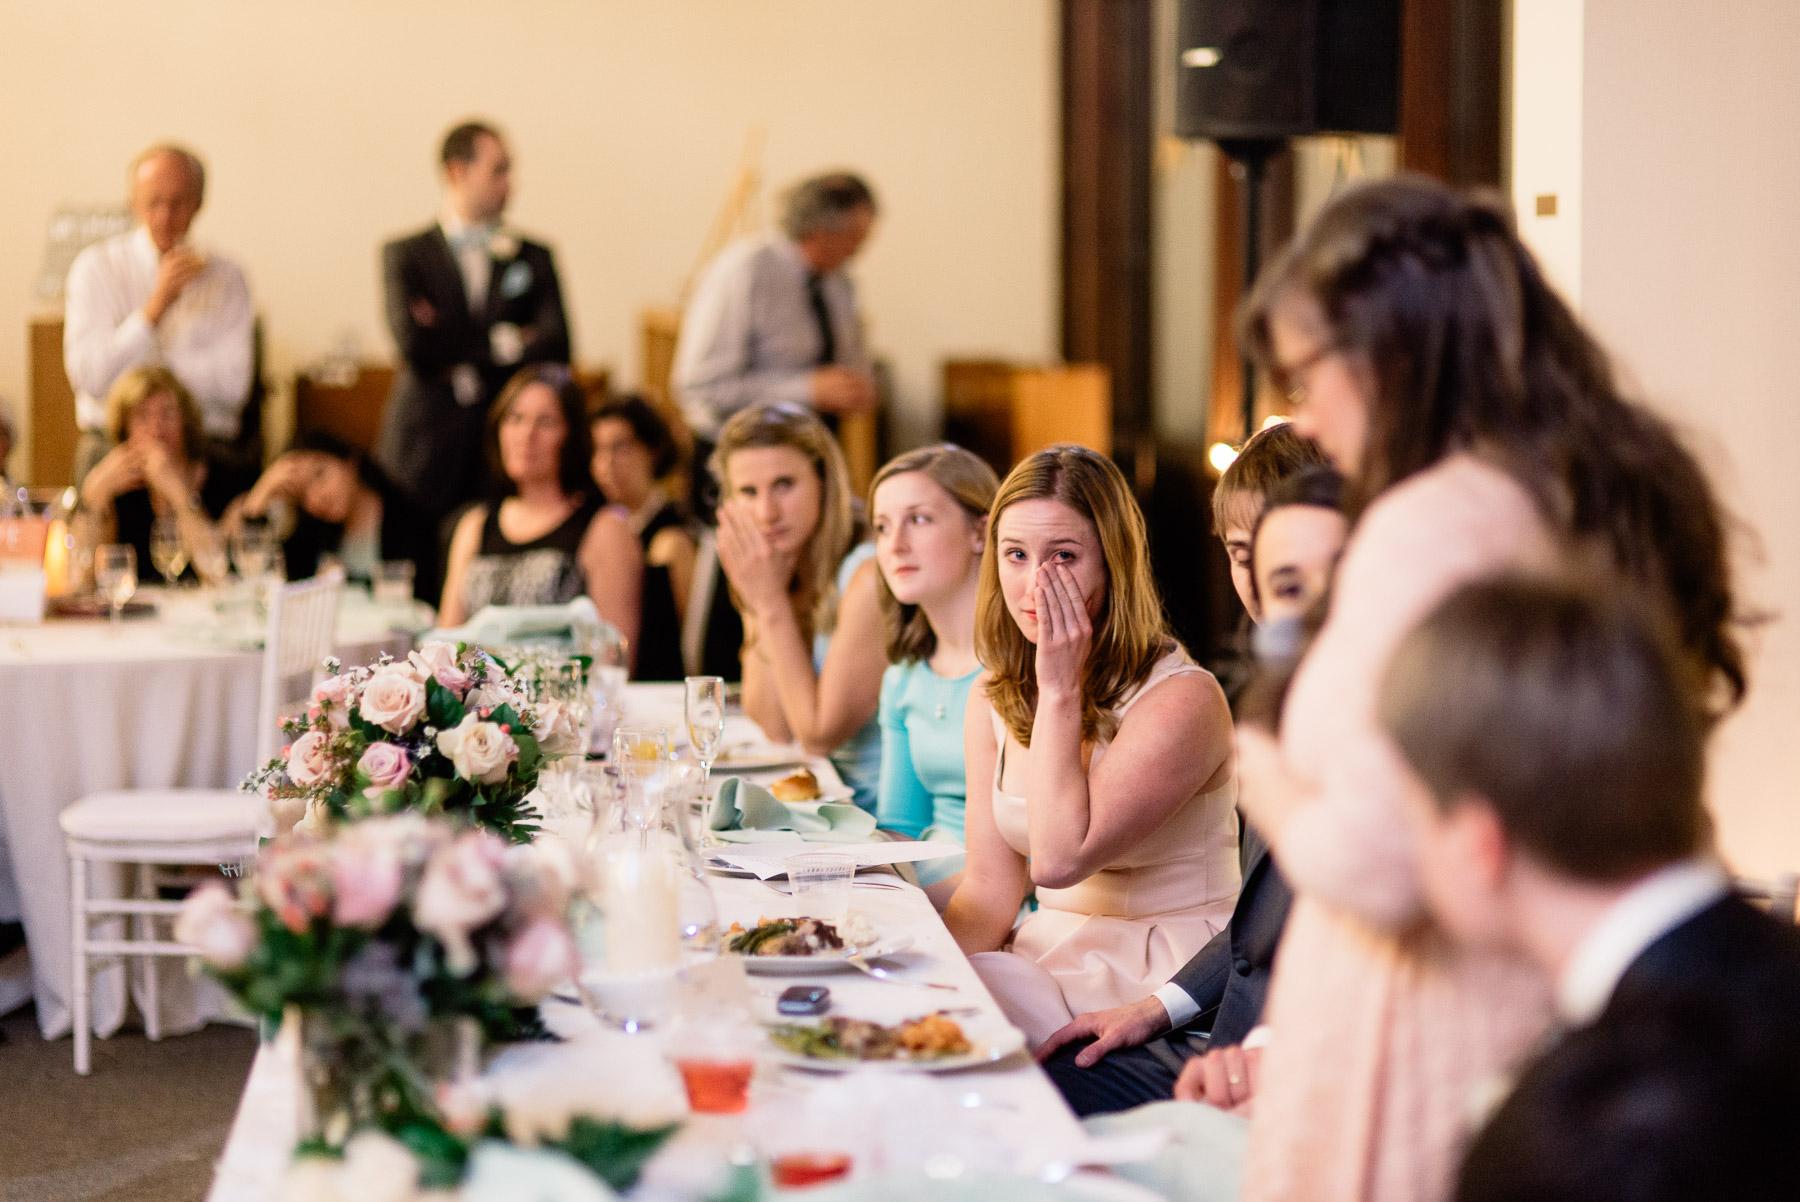 new-york-wedding-photos-25.jpg